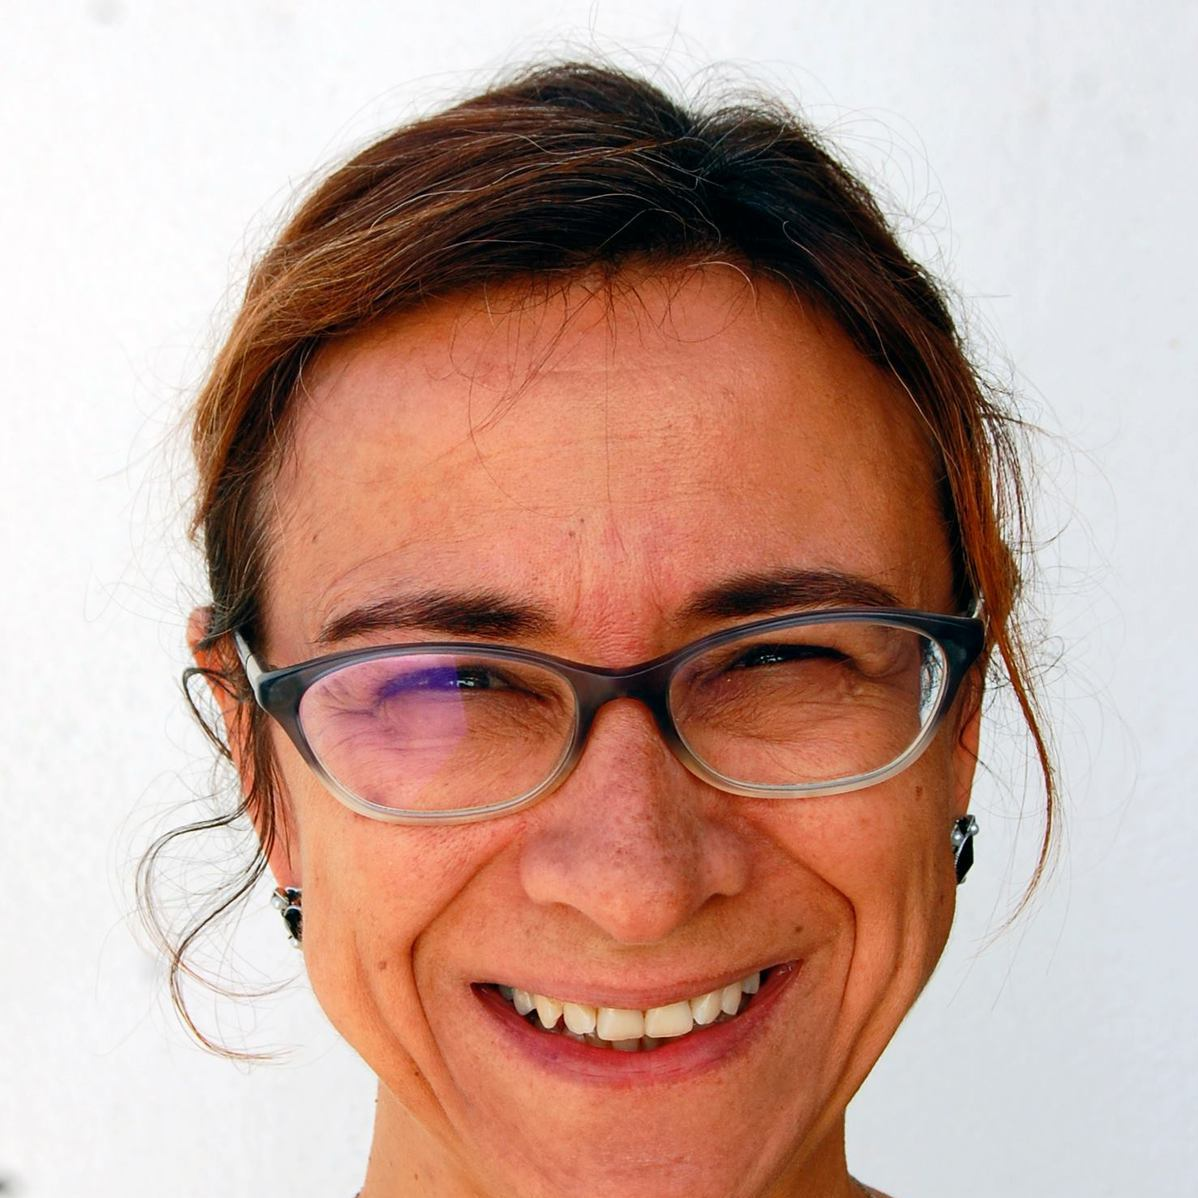 Joana Caspurro